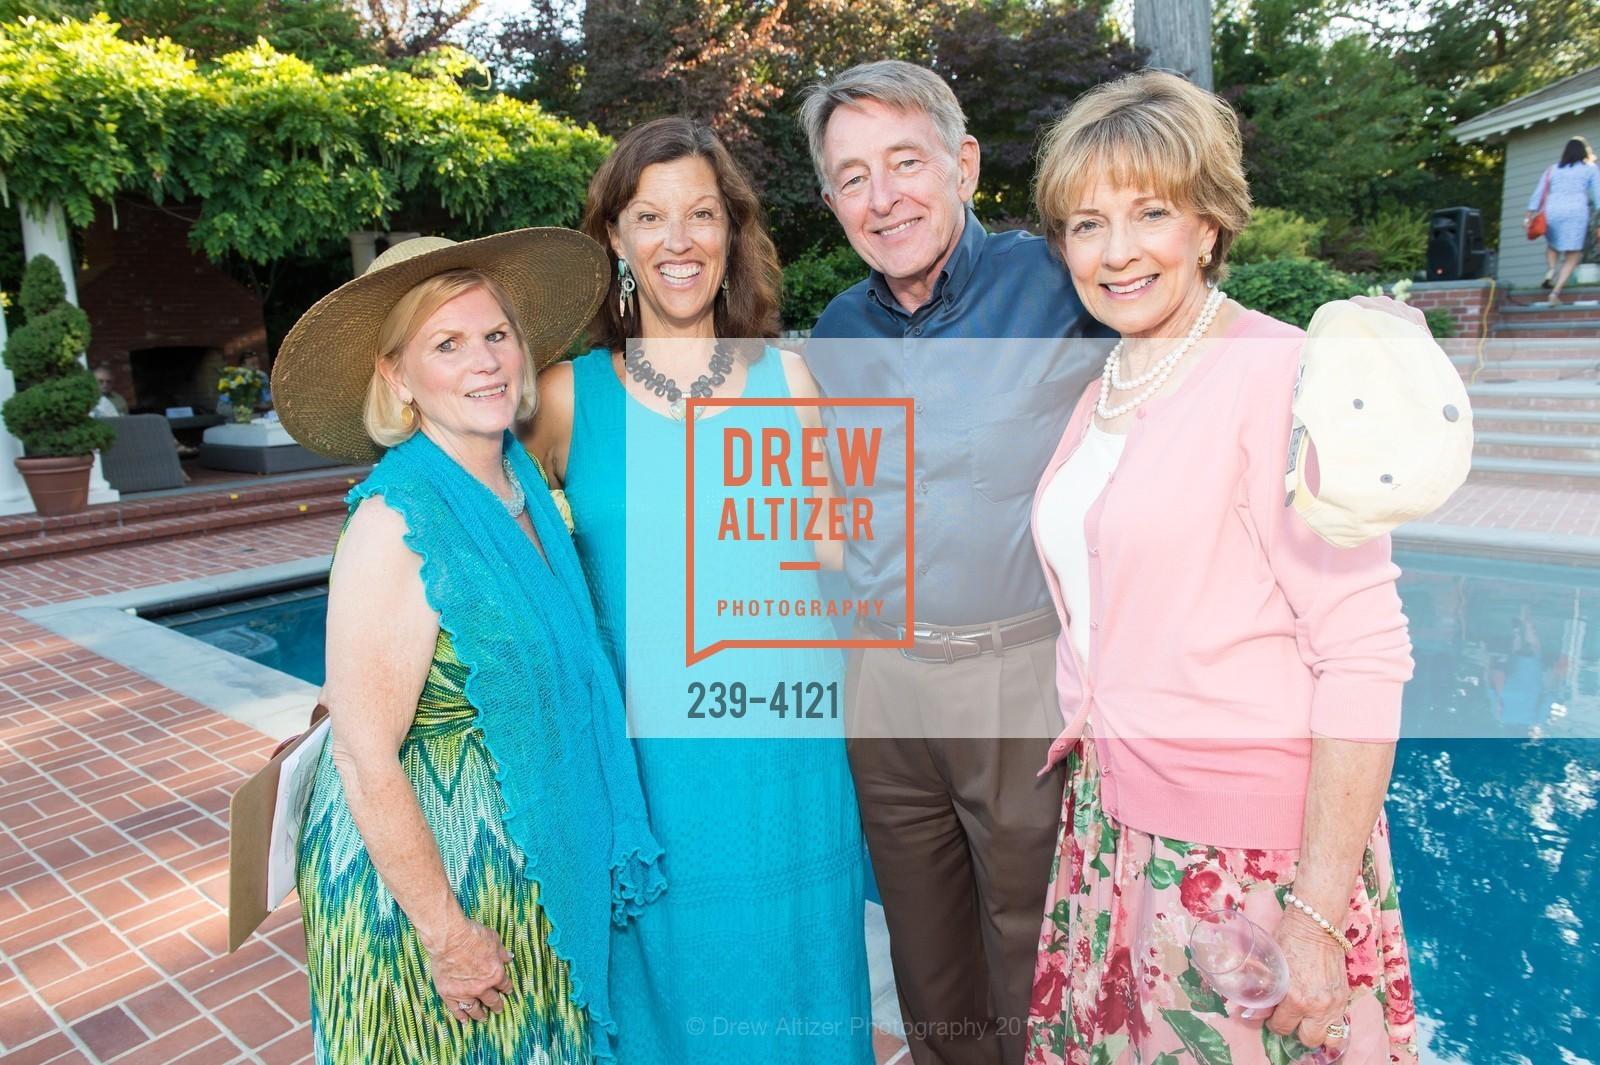 Gayle Carboni, Jenny Kelcher, Steve Weller, Nancy Weller, Photo #239-4121